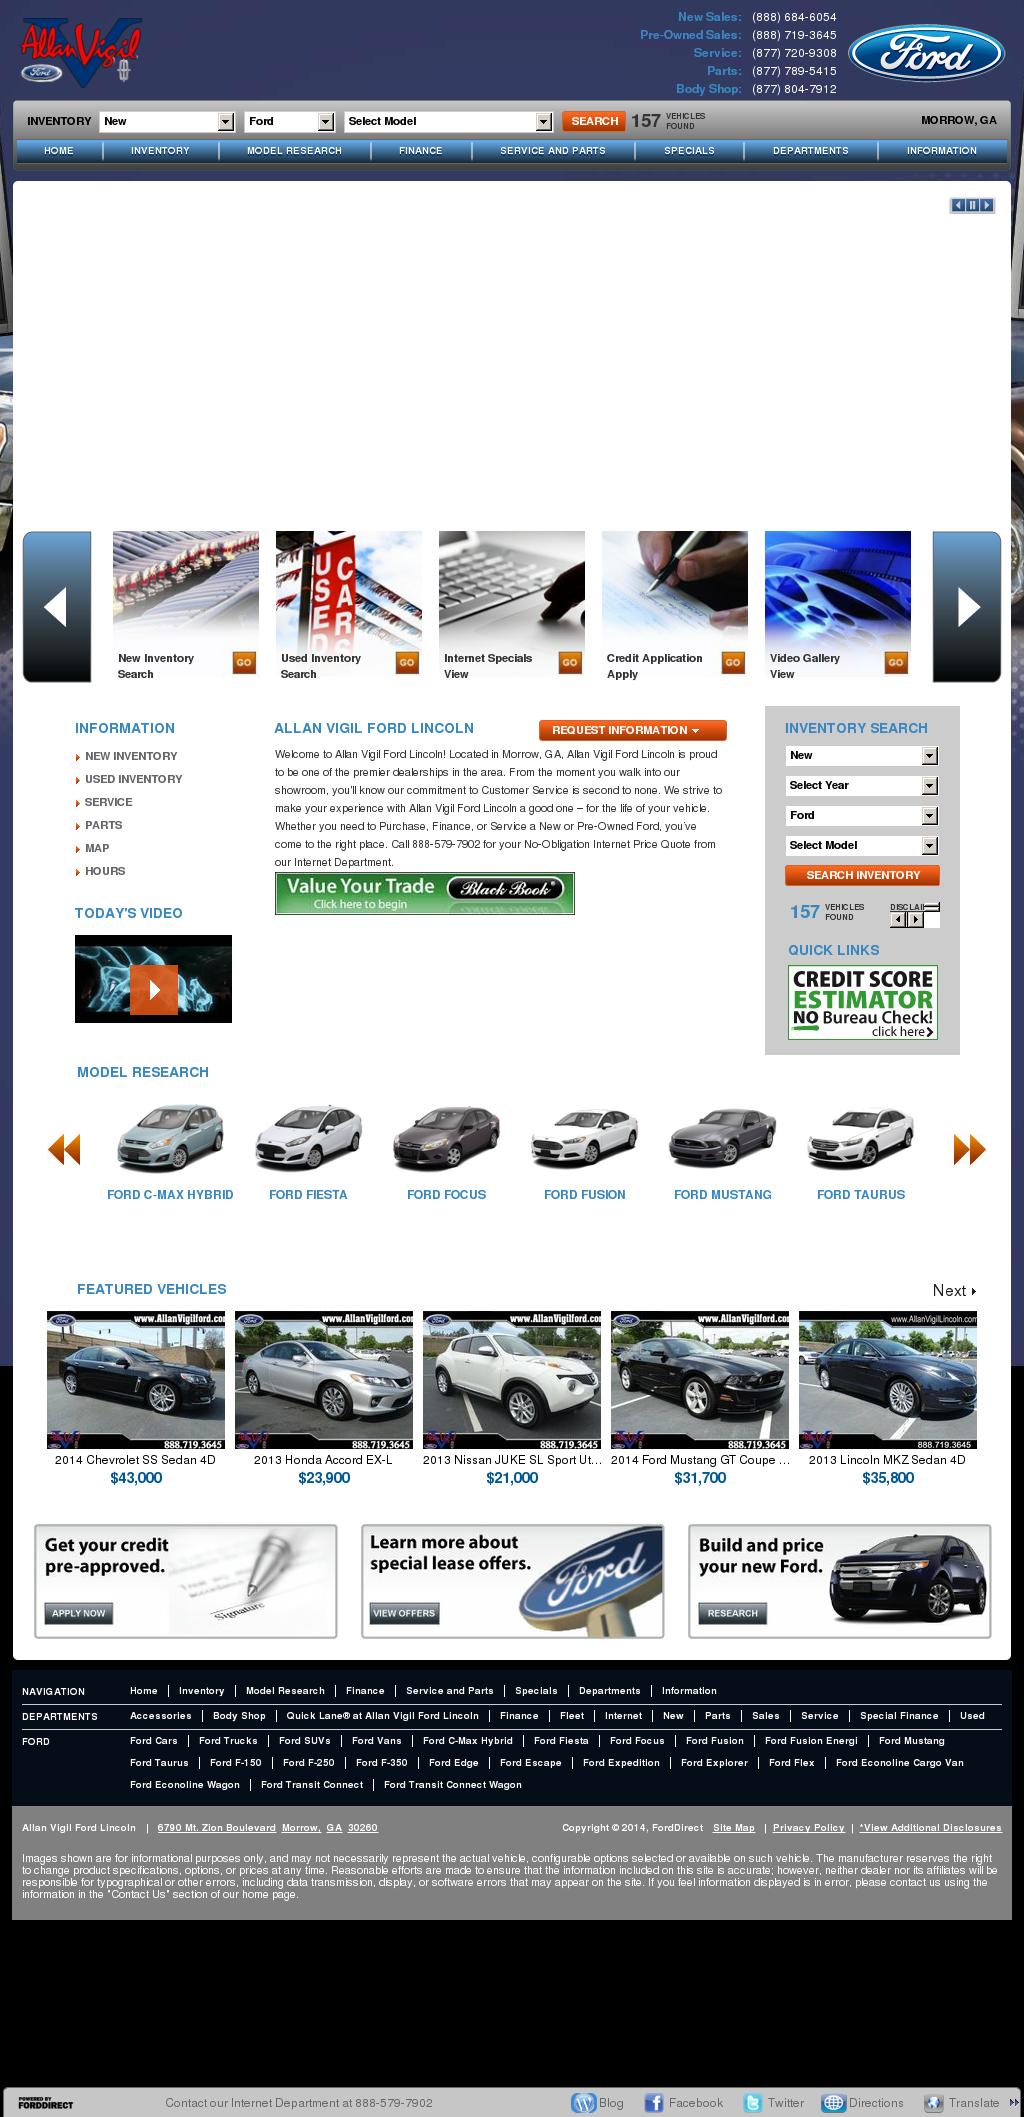 Allan Vigil Ford Morrow Ga >> Allan Vigil Ford Competitors Revenue And Employees Owler